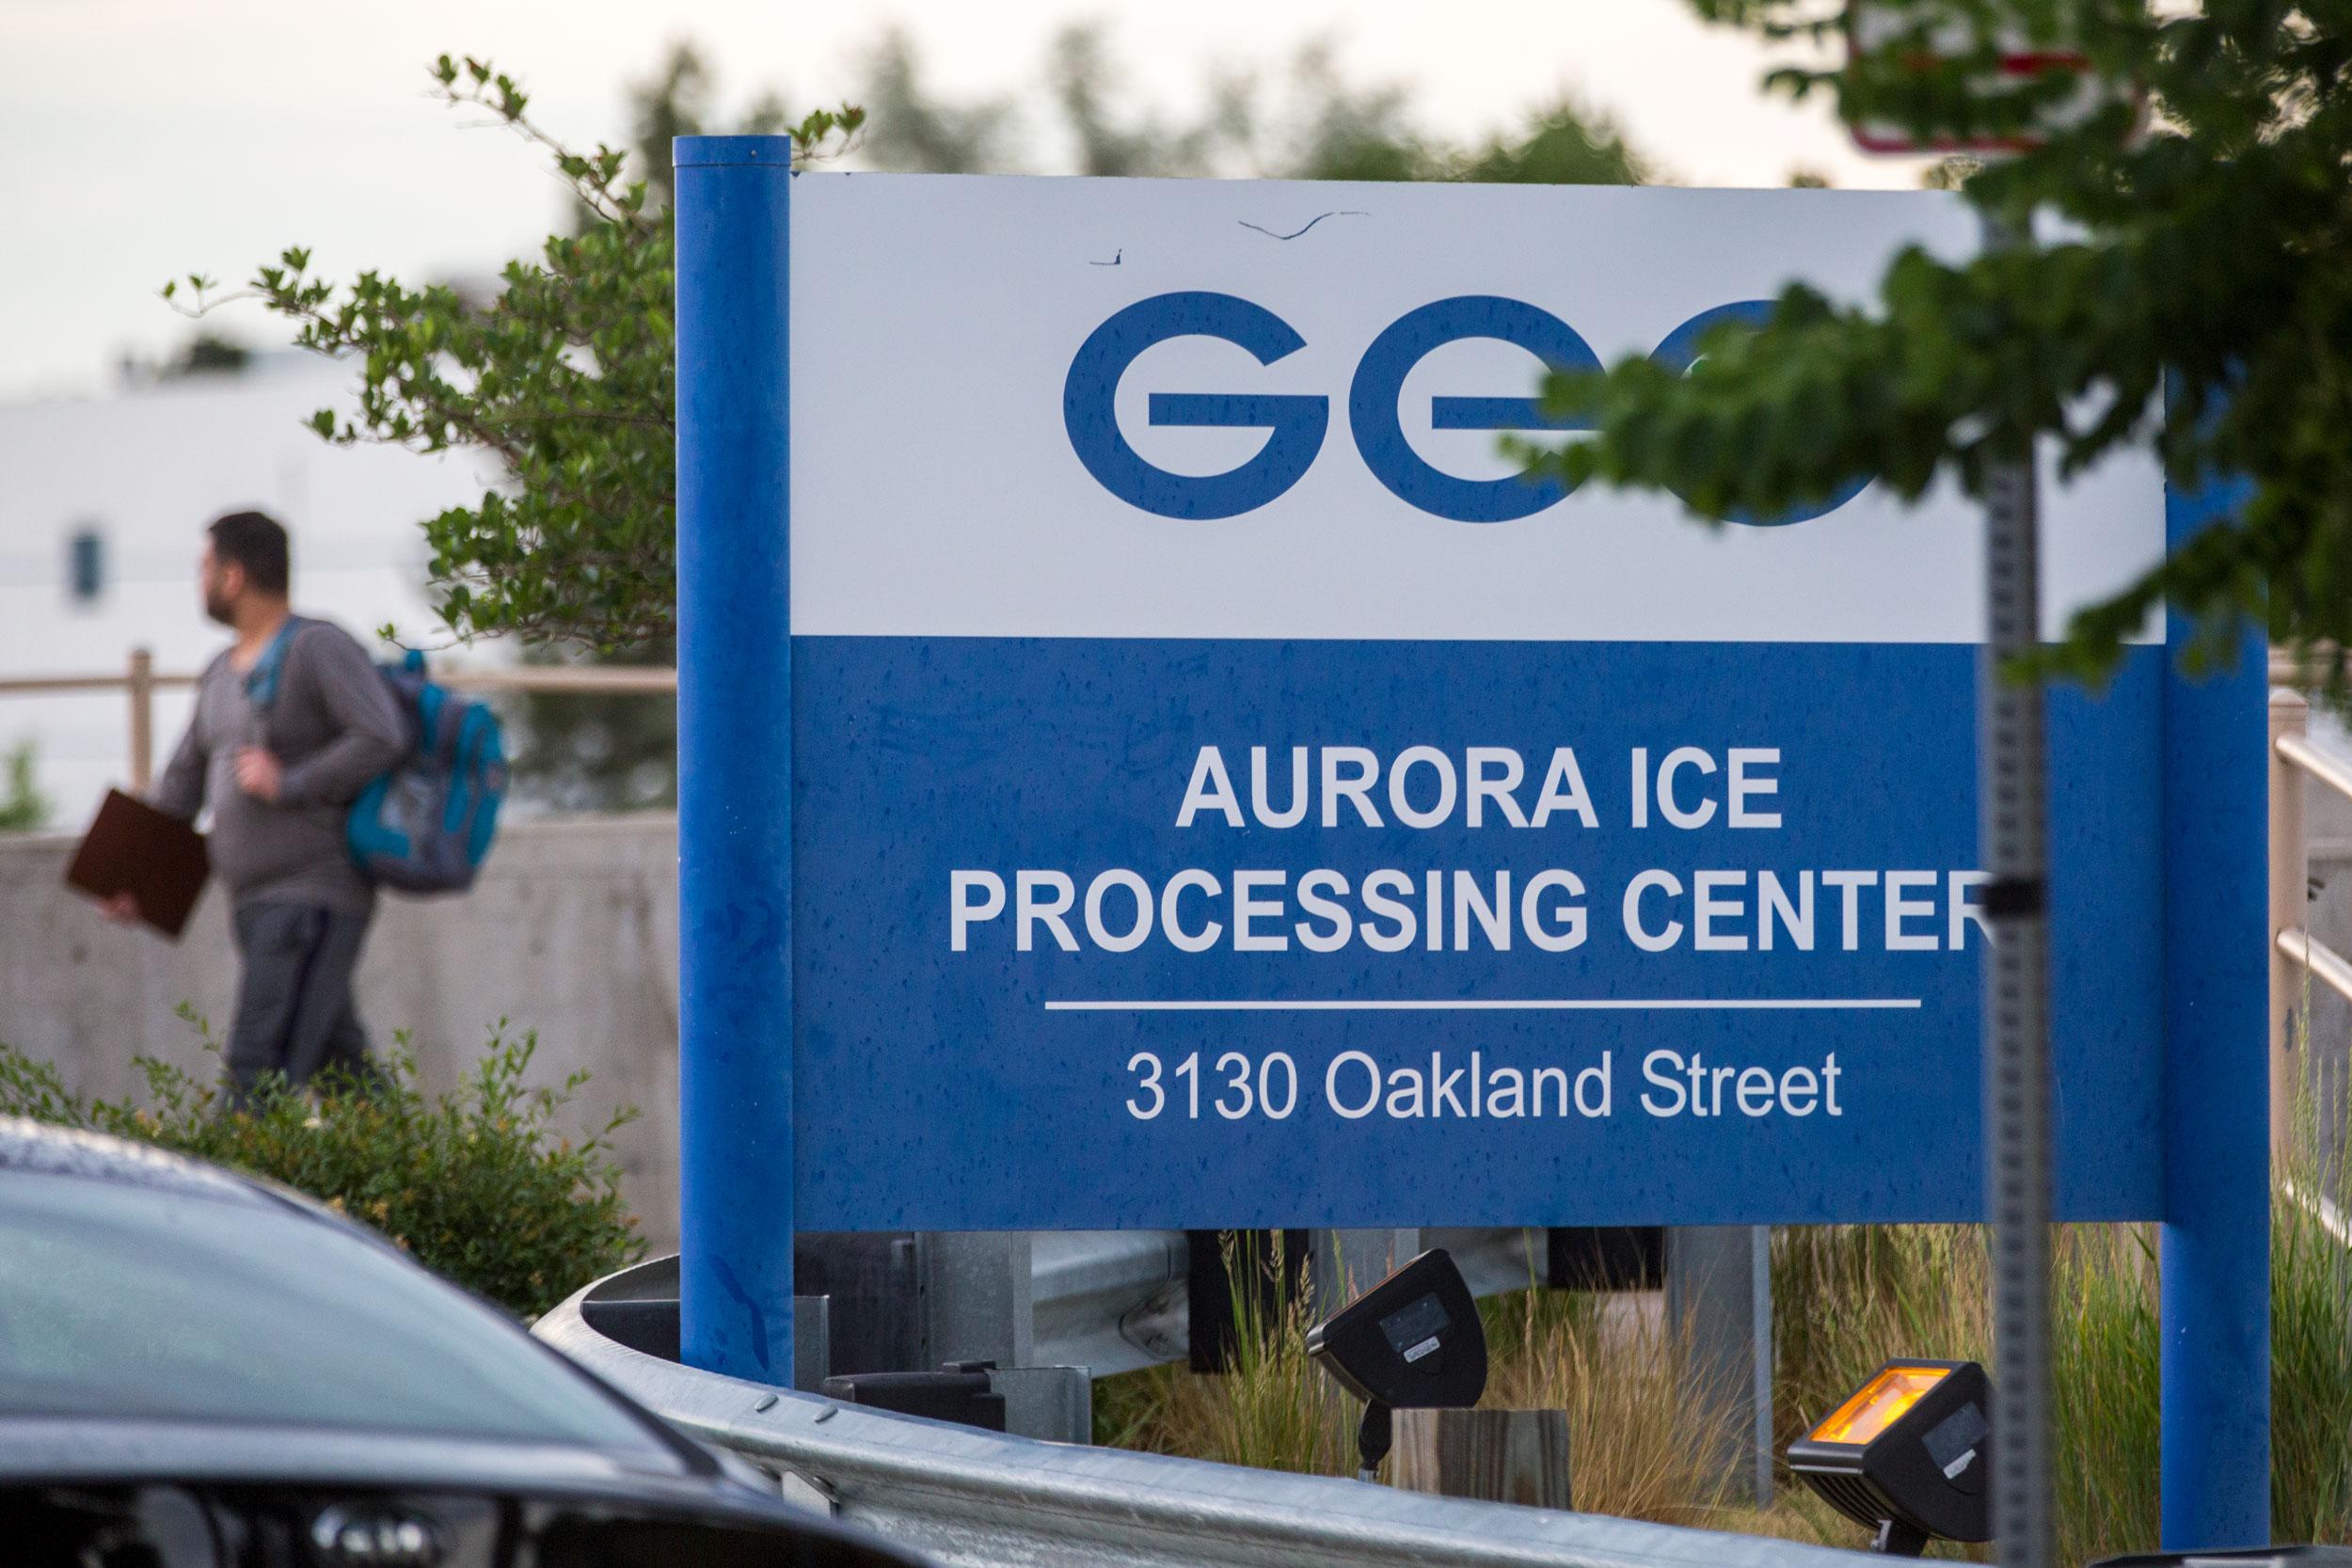 ICE GEO Aurora